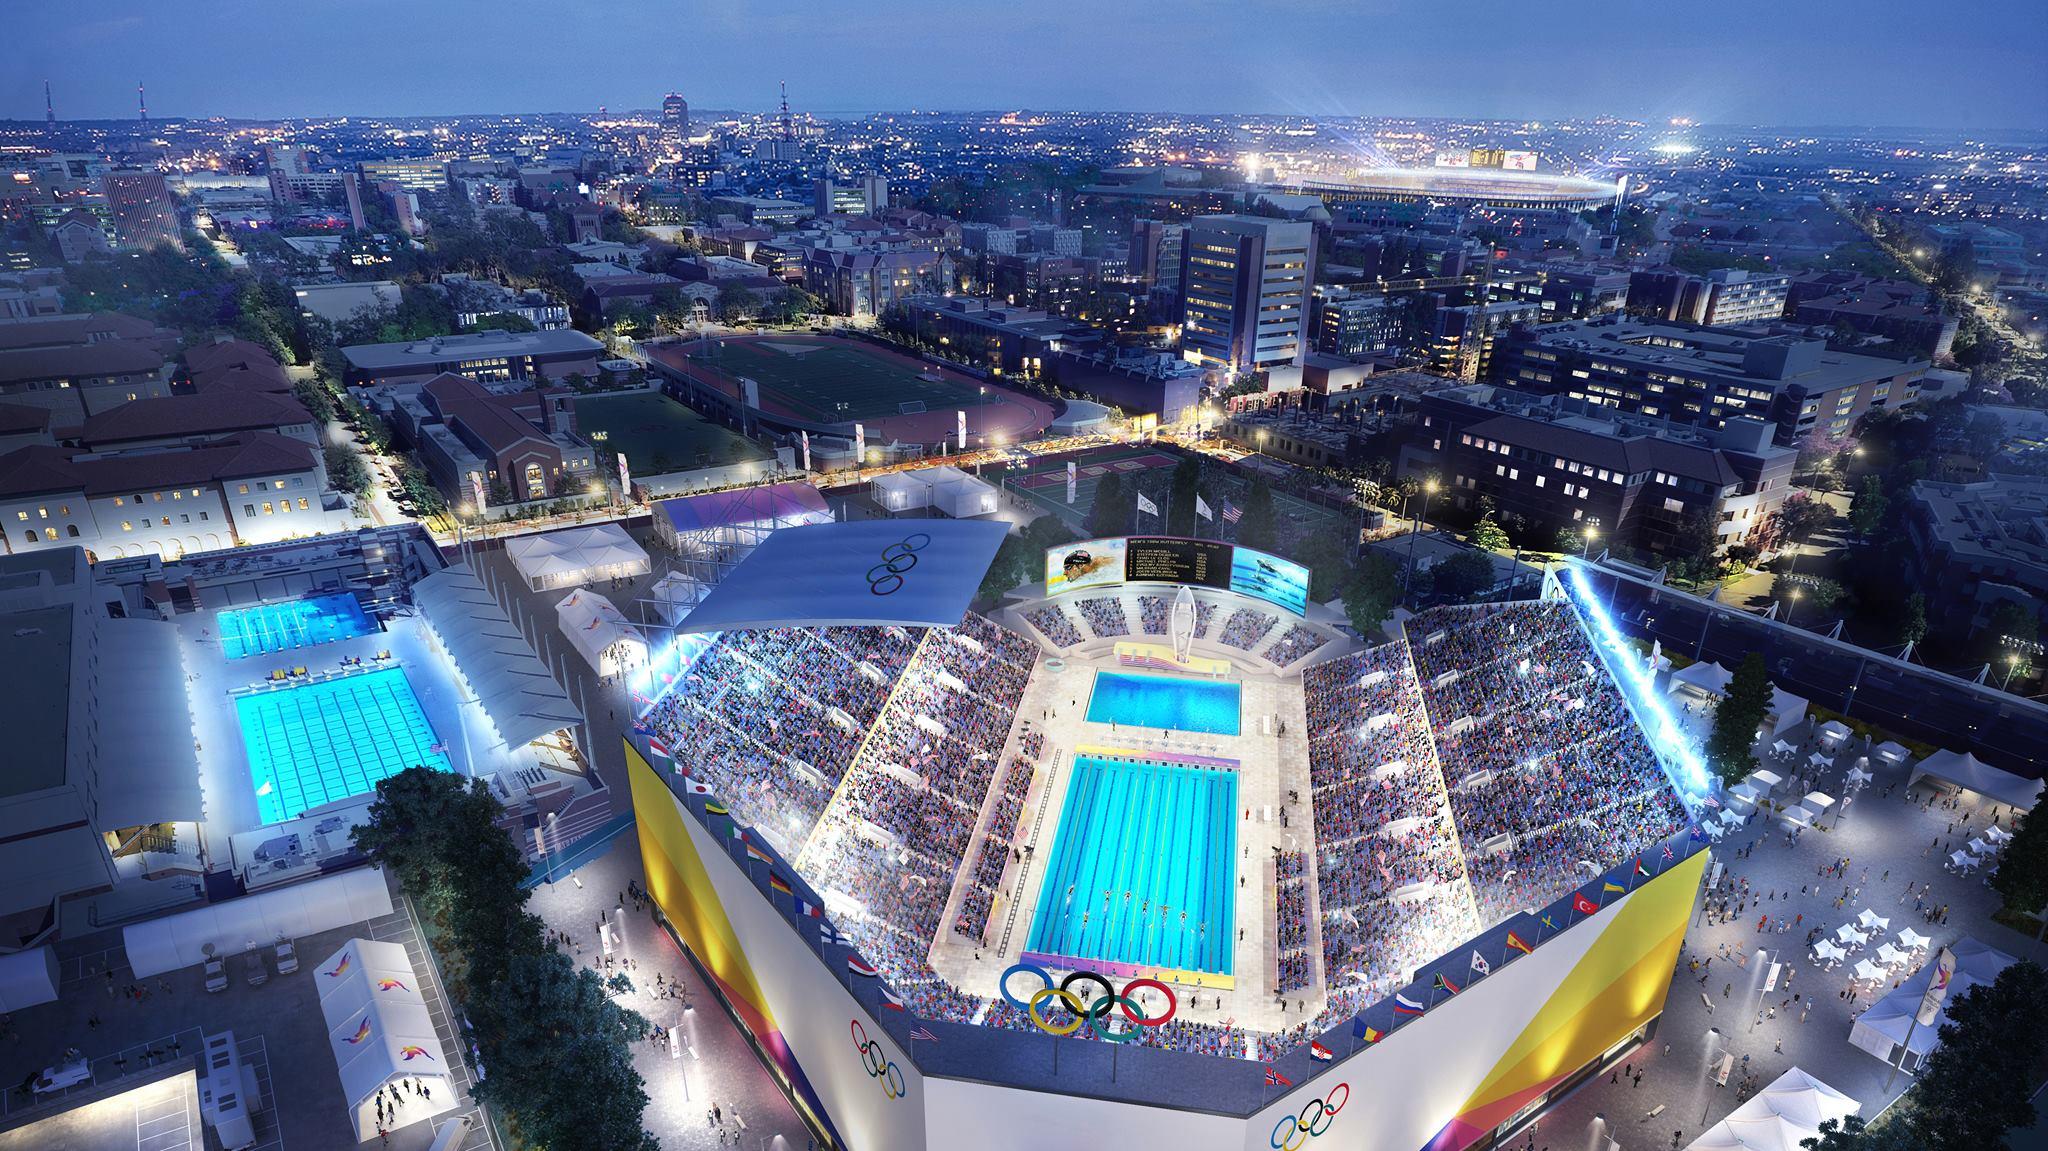 La 2024 Los Angeles 2024 Olympic Bid The Venues